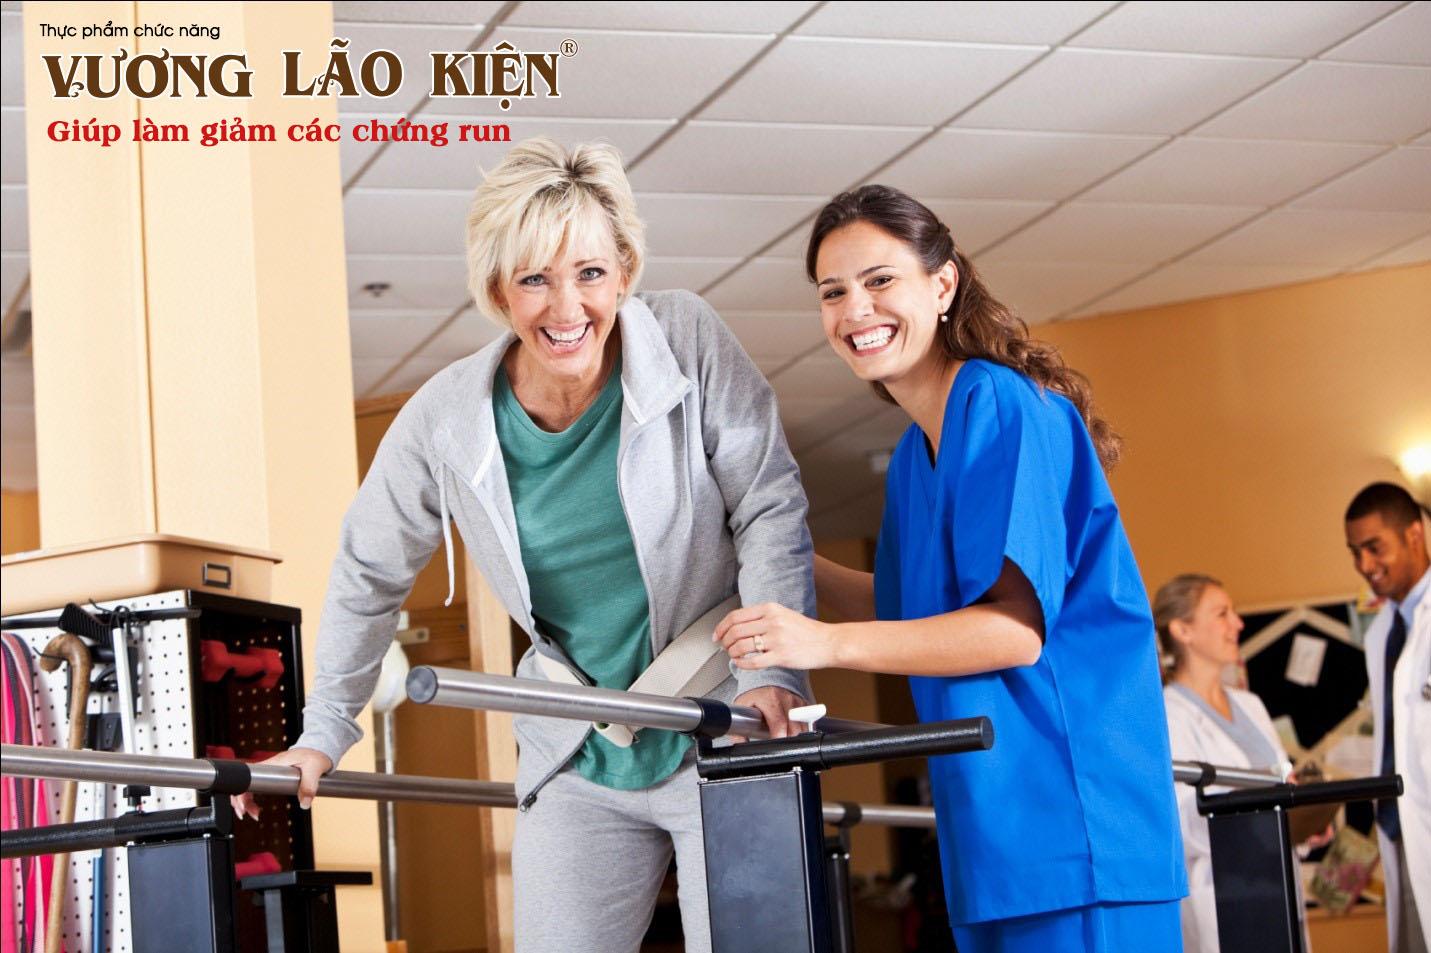 Vat-ly-tri-lieu-co-the-khong-hieu-qua-o-nguoi-benh-Parkinson-giai-doan-som